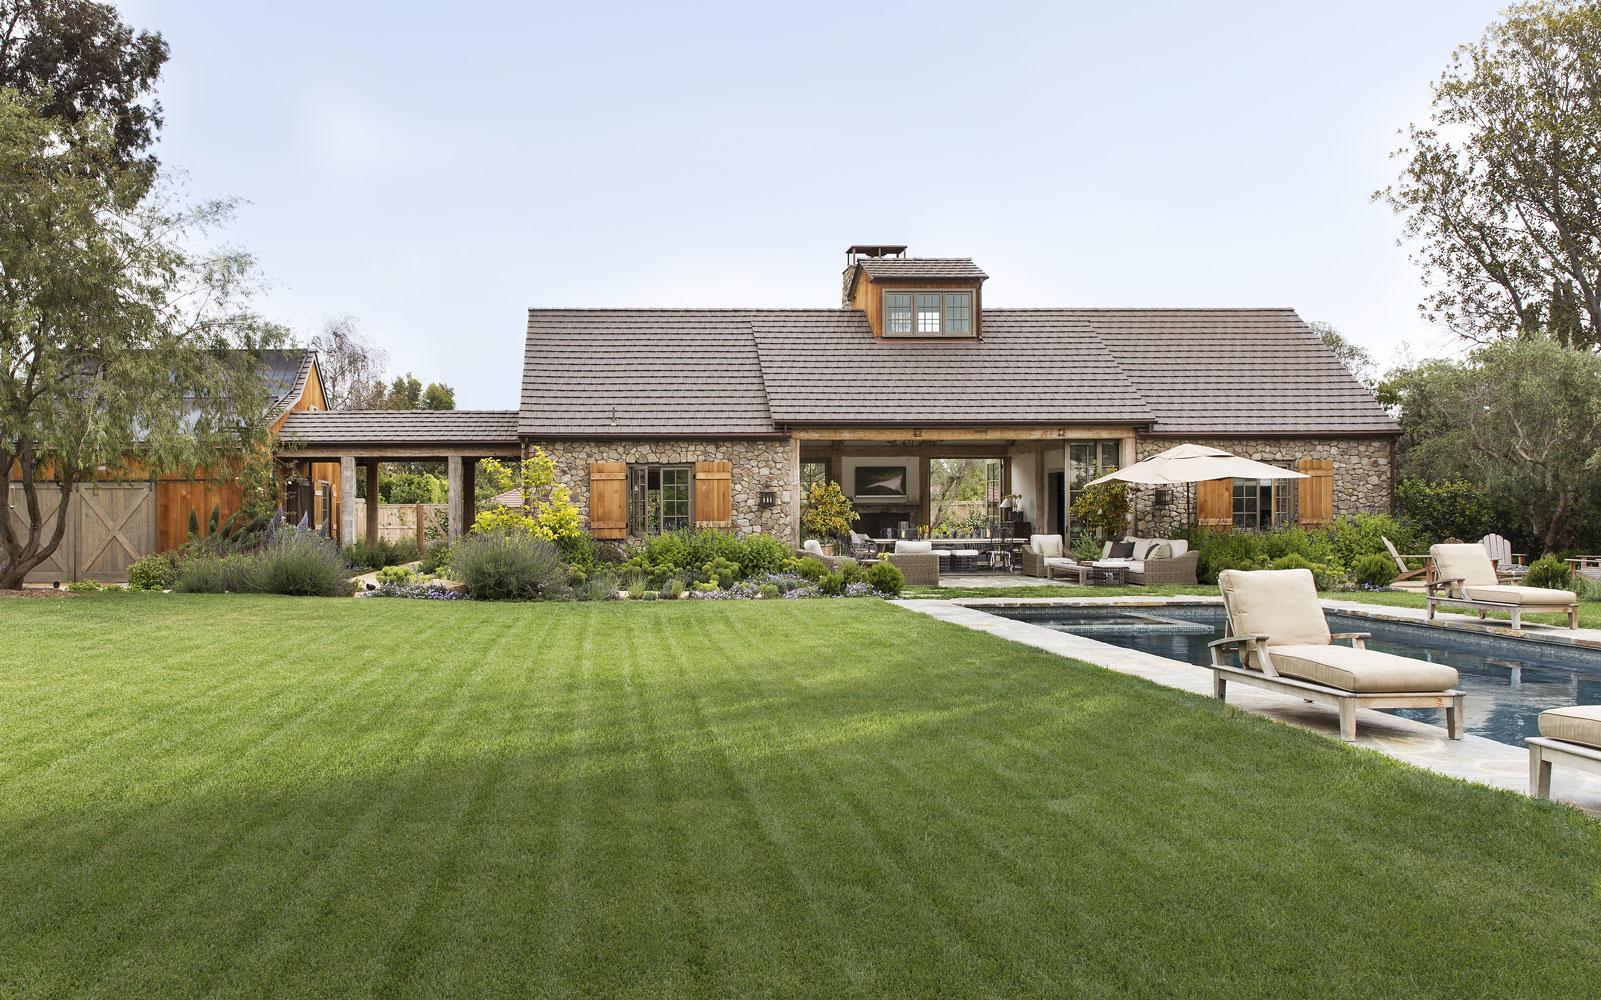 Rustic-Modern-Farmhouse-Pool-Premier-General-Contractors.jpg